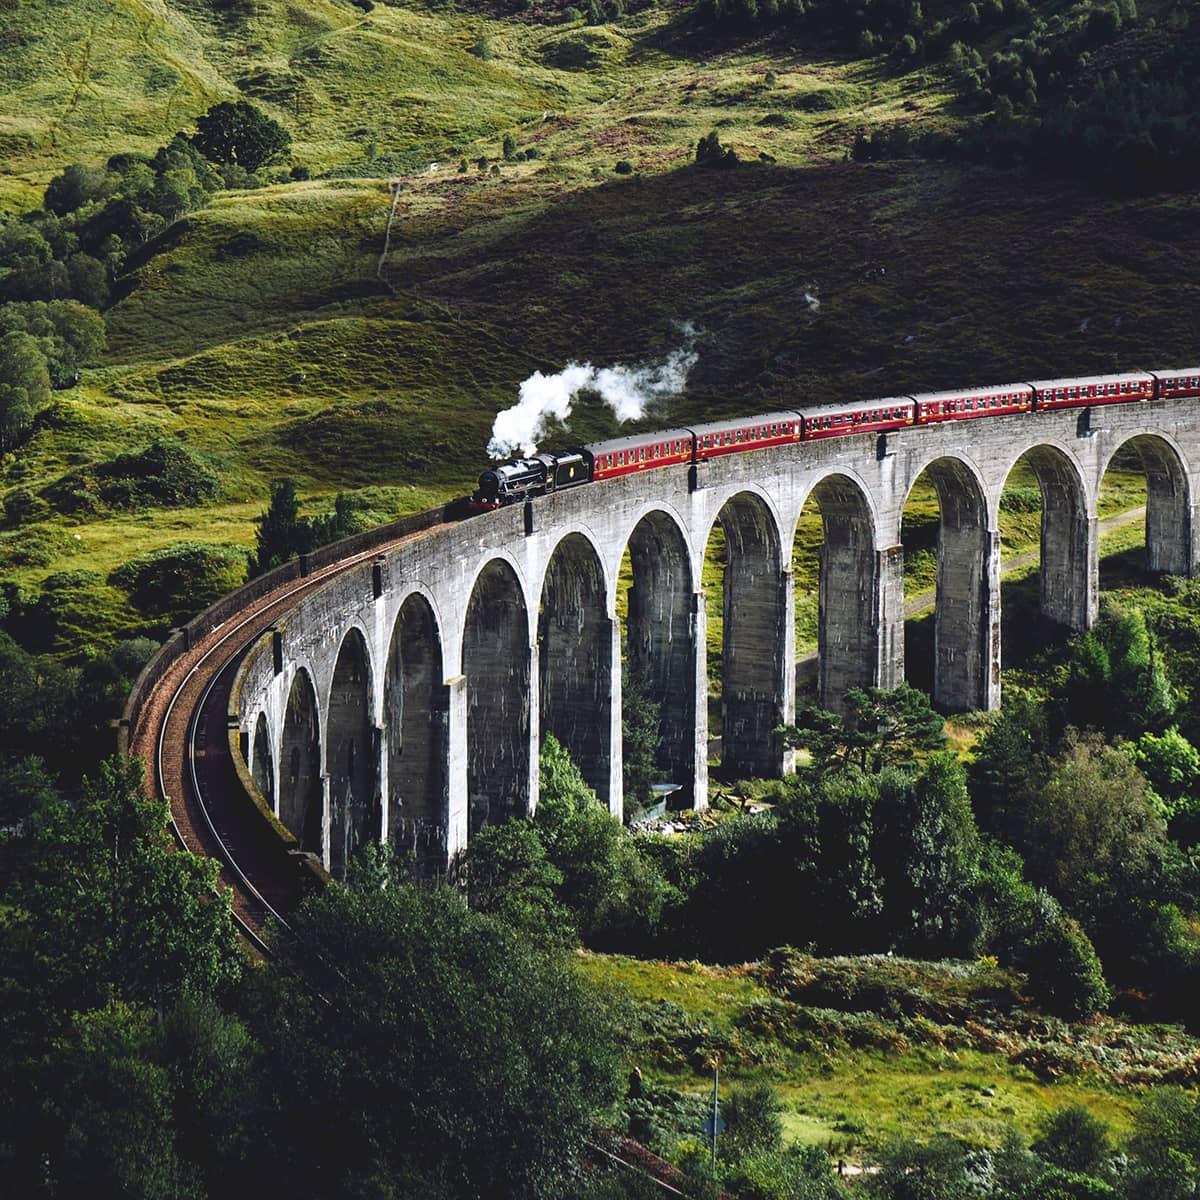 hogwarts-express-harry-potter-train